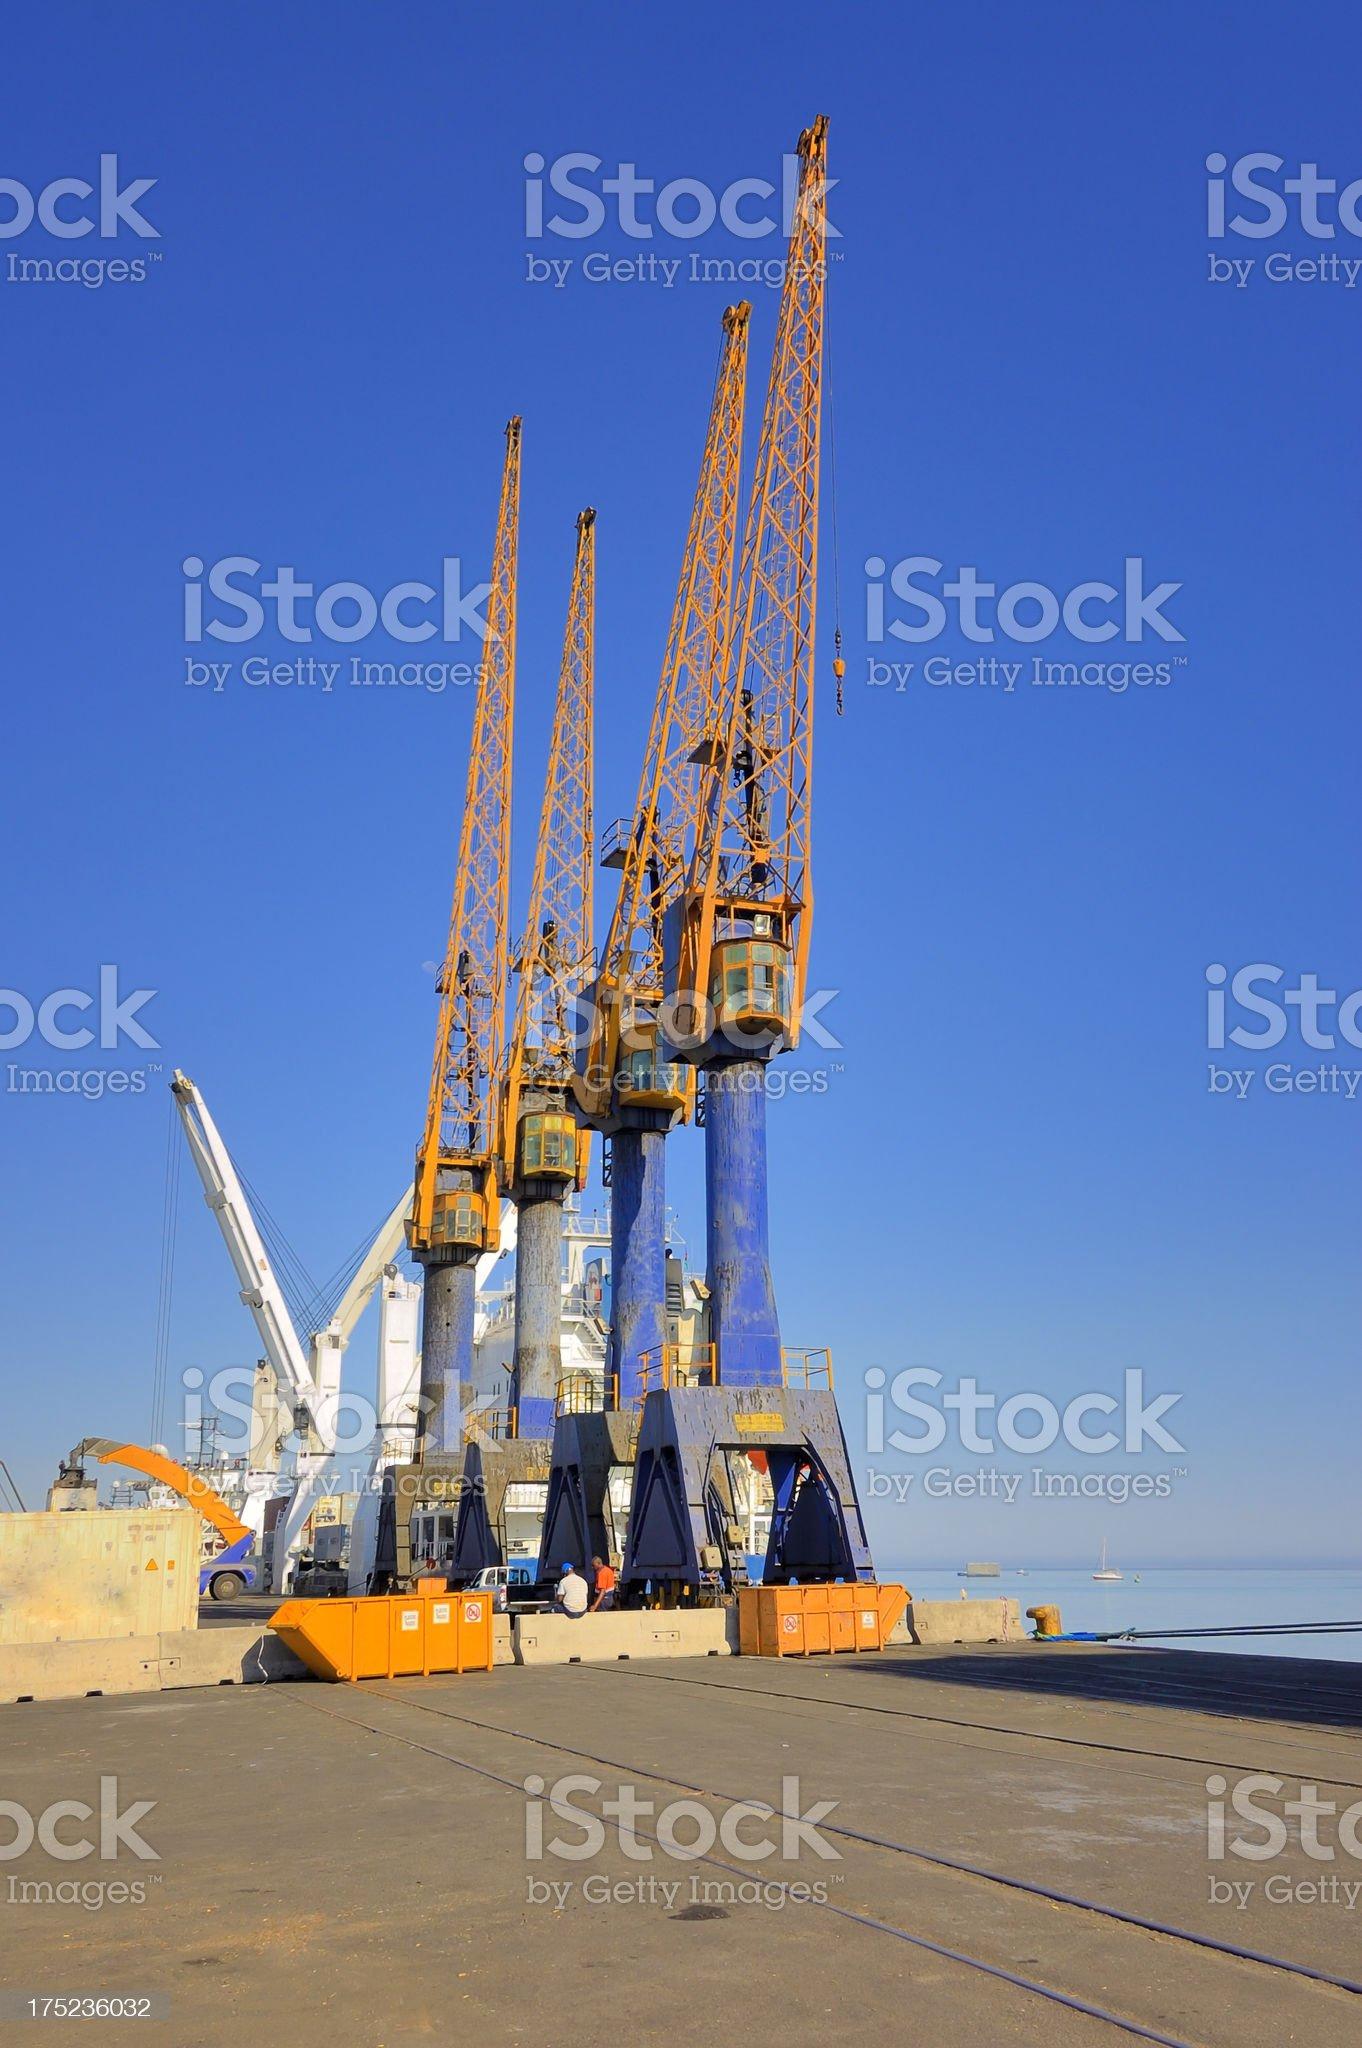 Walvis Bay Tower Dock Cranes royalty-free stock photo